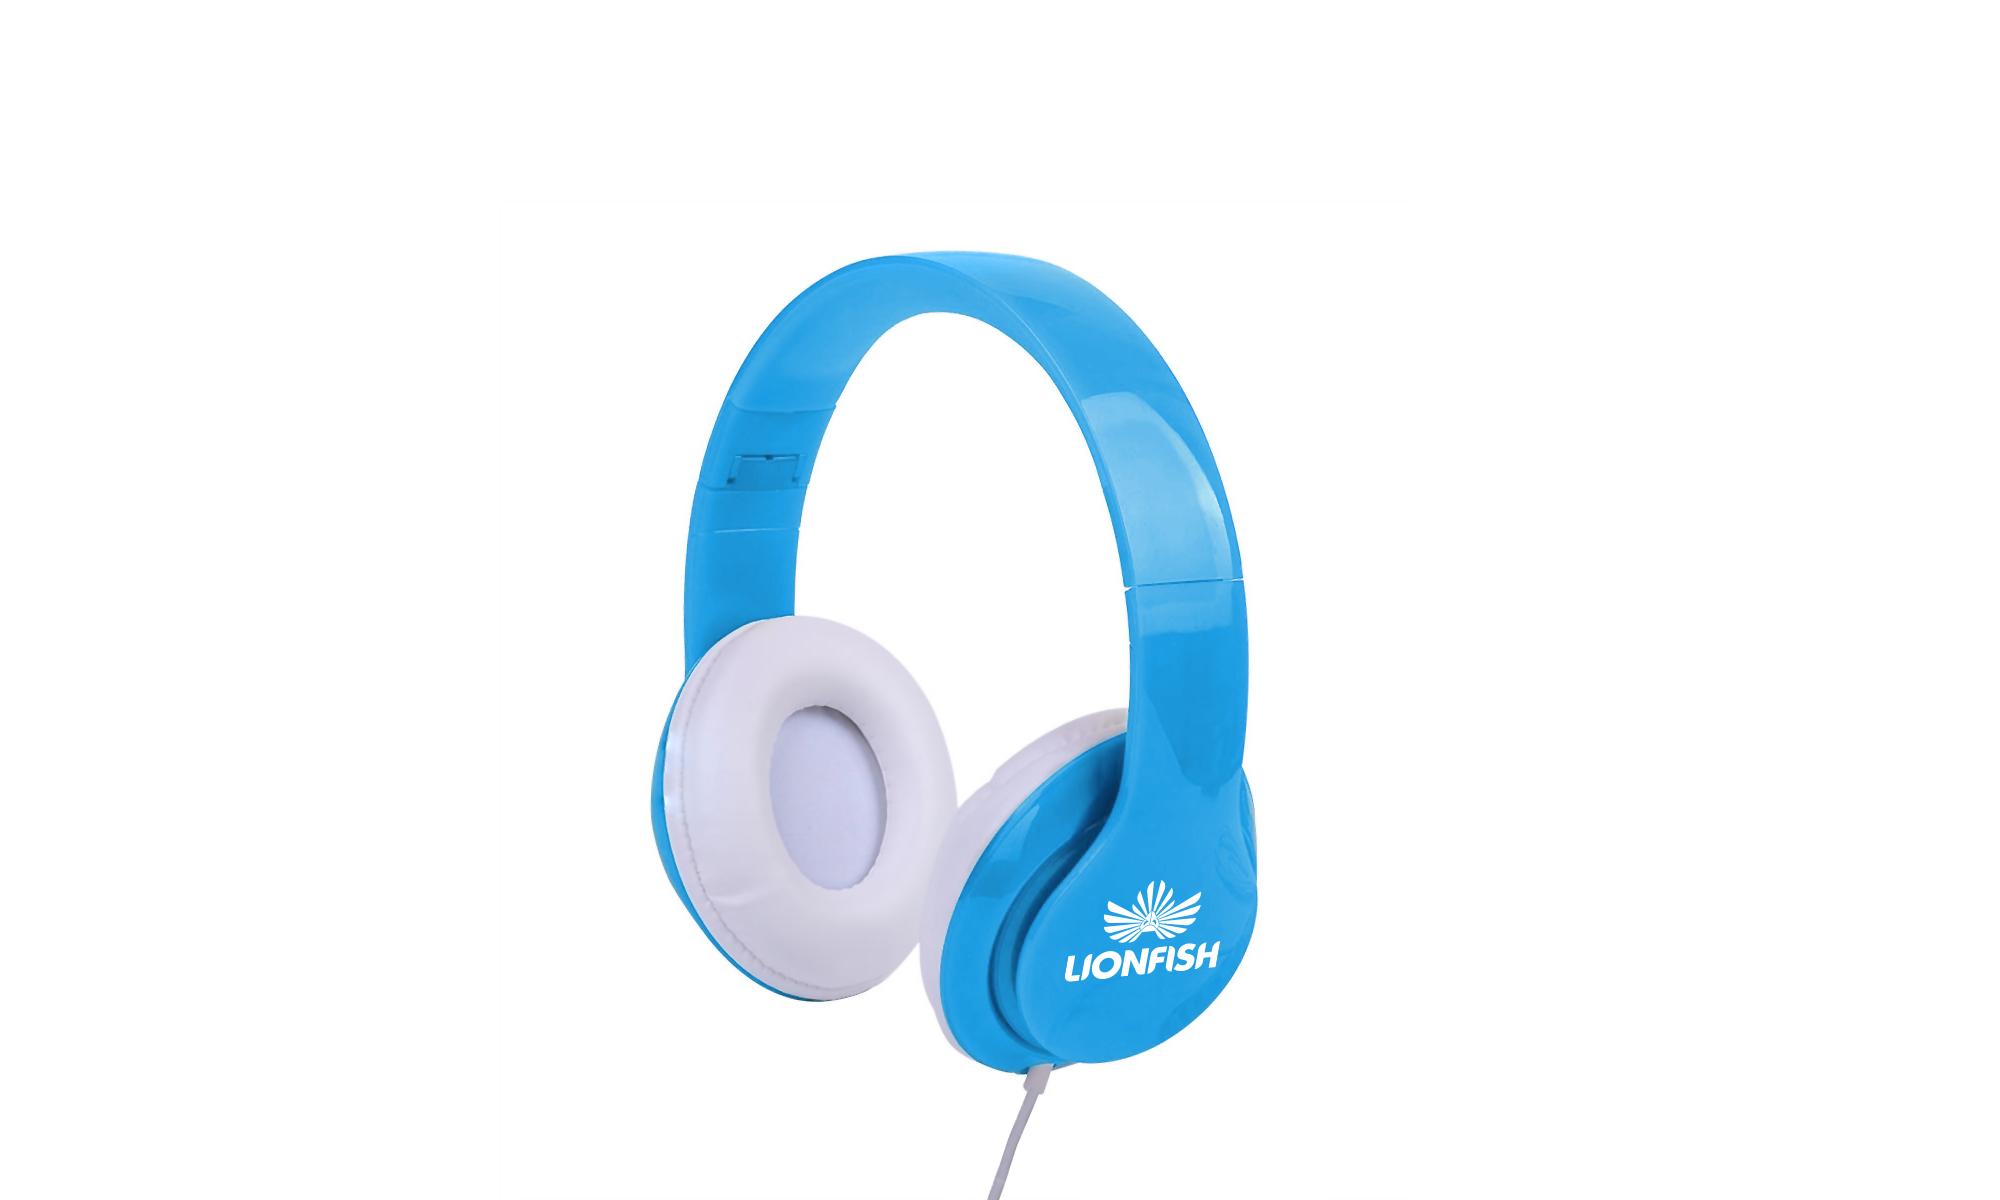 LionFish_Headphones2.png